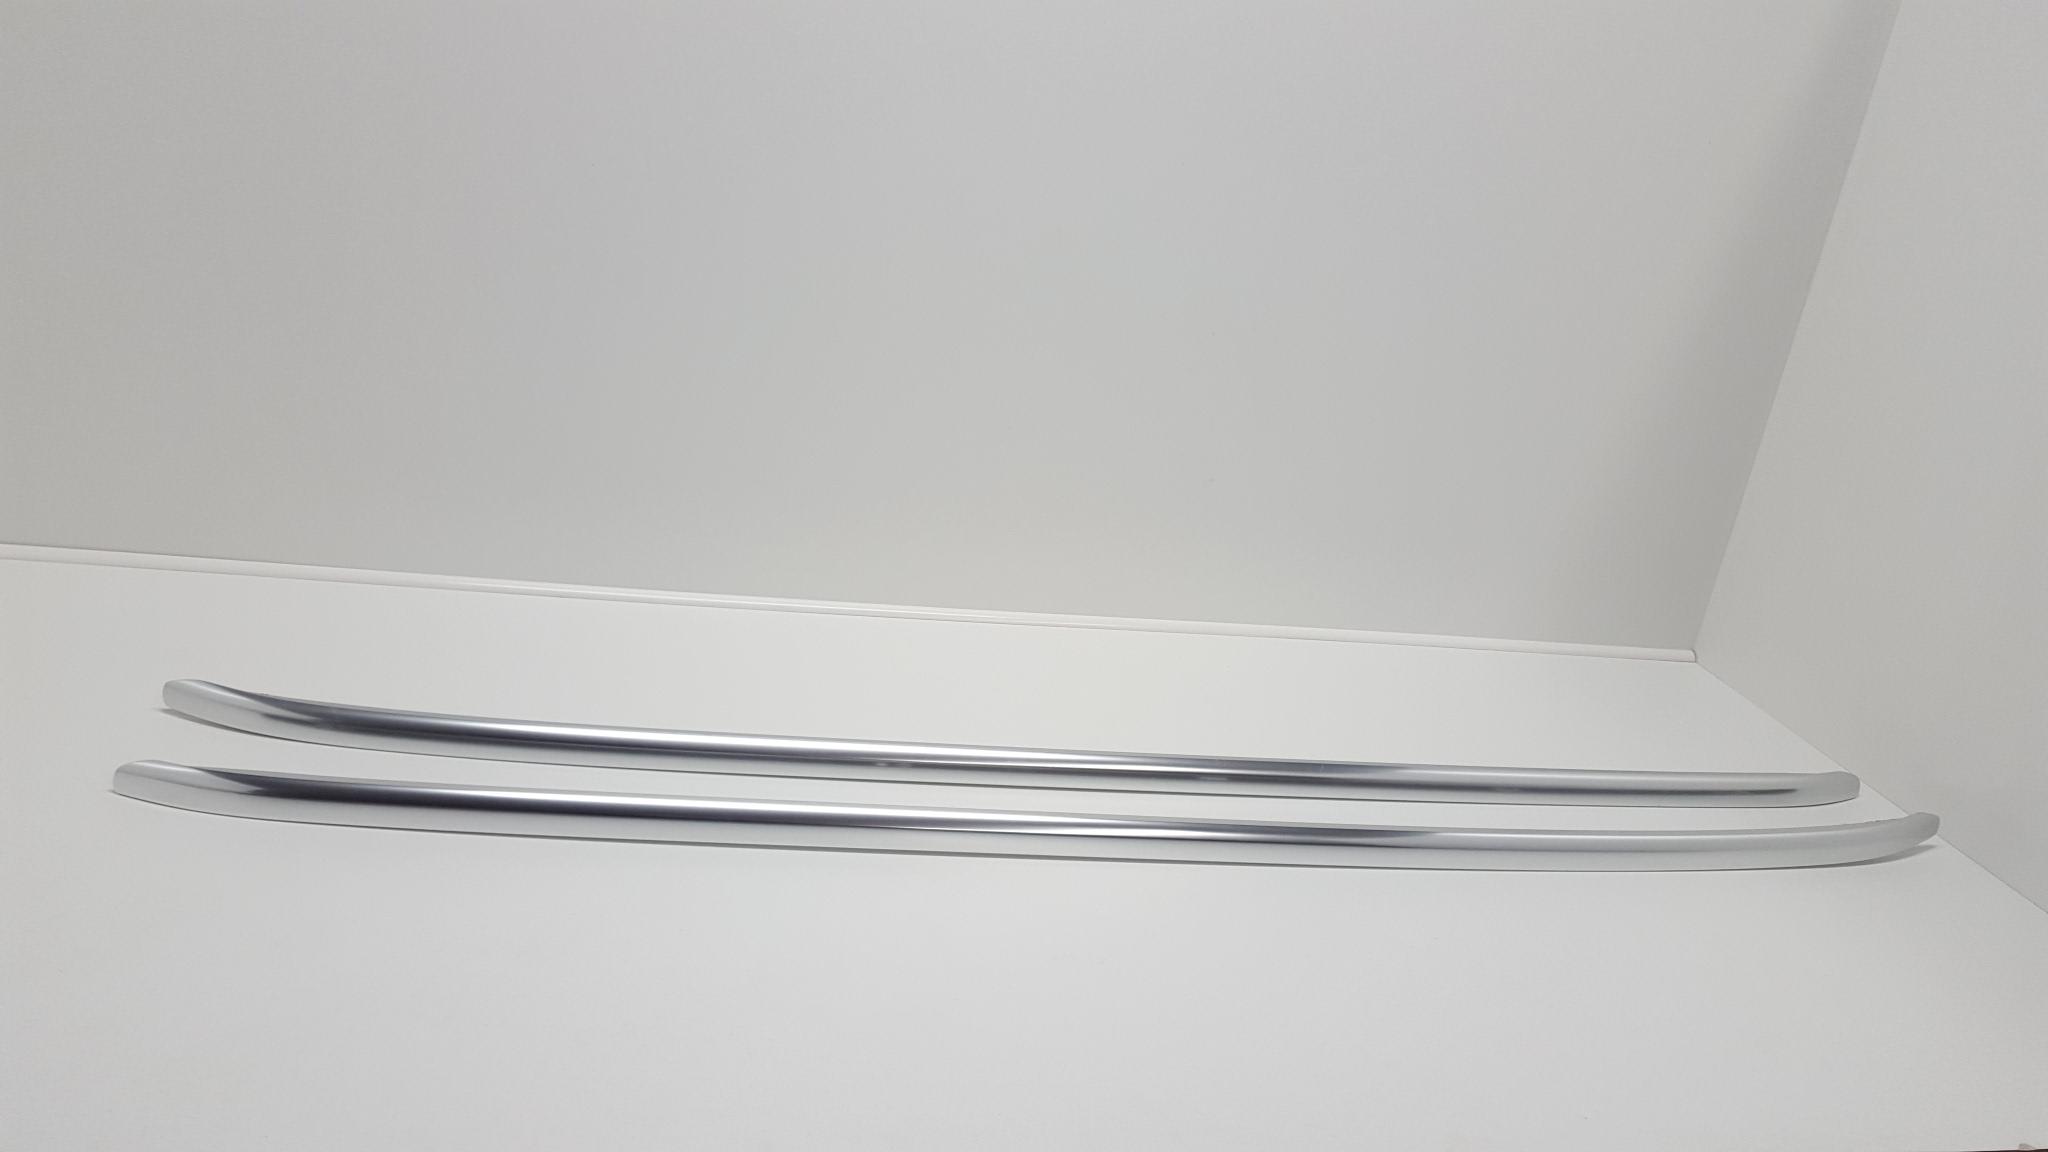 vw passat b8 3g variant dachreling chromreling. Black Bedroom Furniture Sets. Home Design Ideas